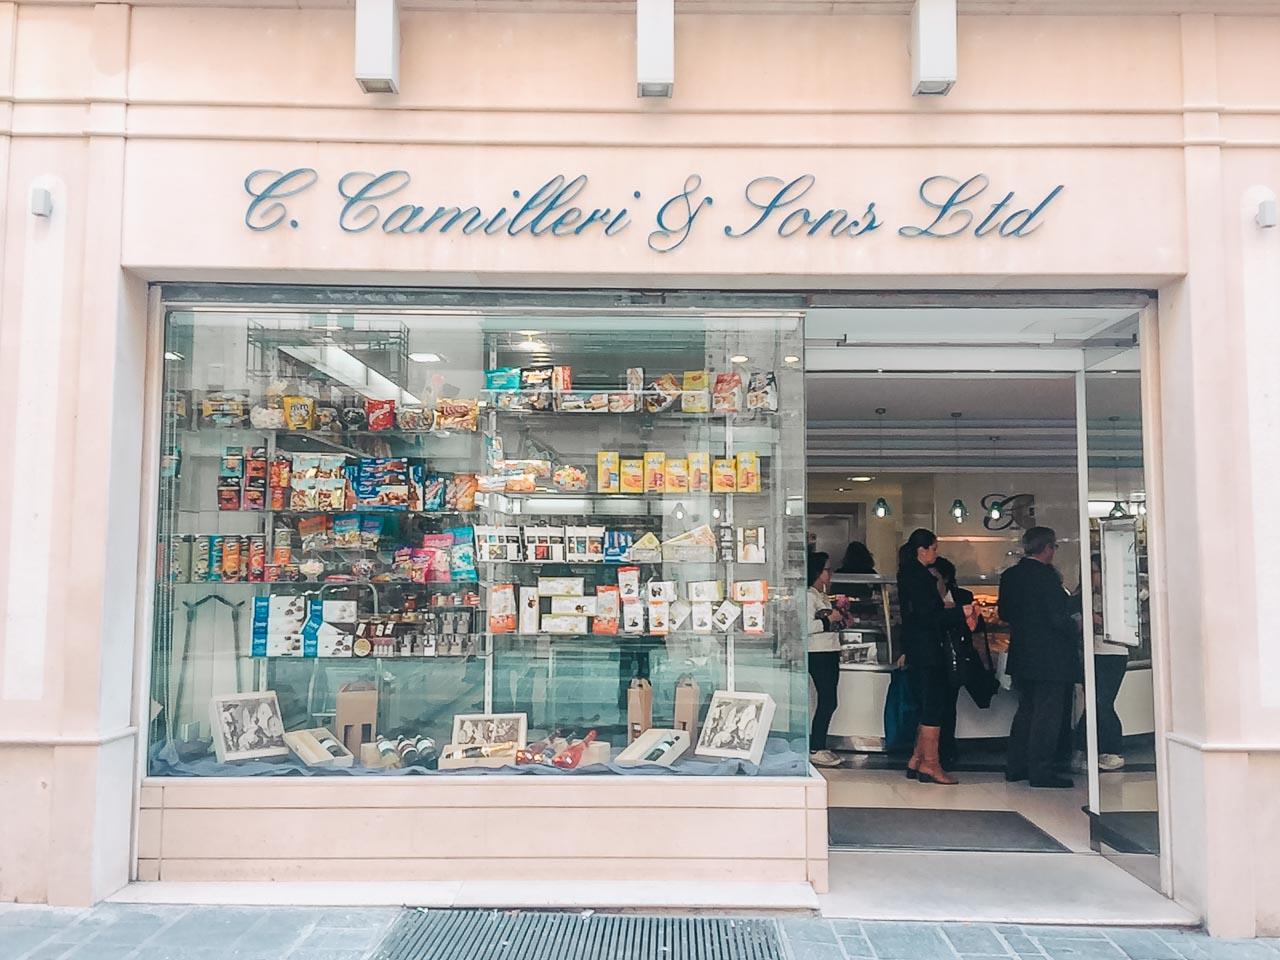 C. Camilleri & Sons - the oldest confectionary shop in Valletta, Malta